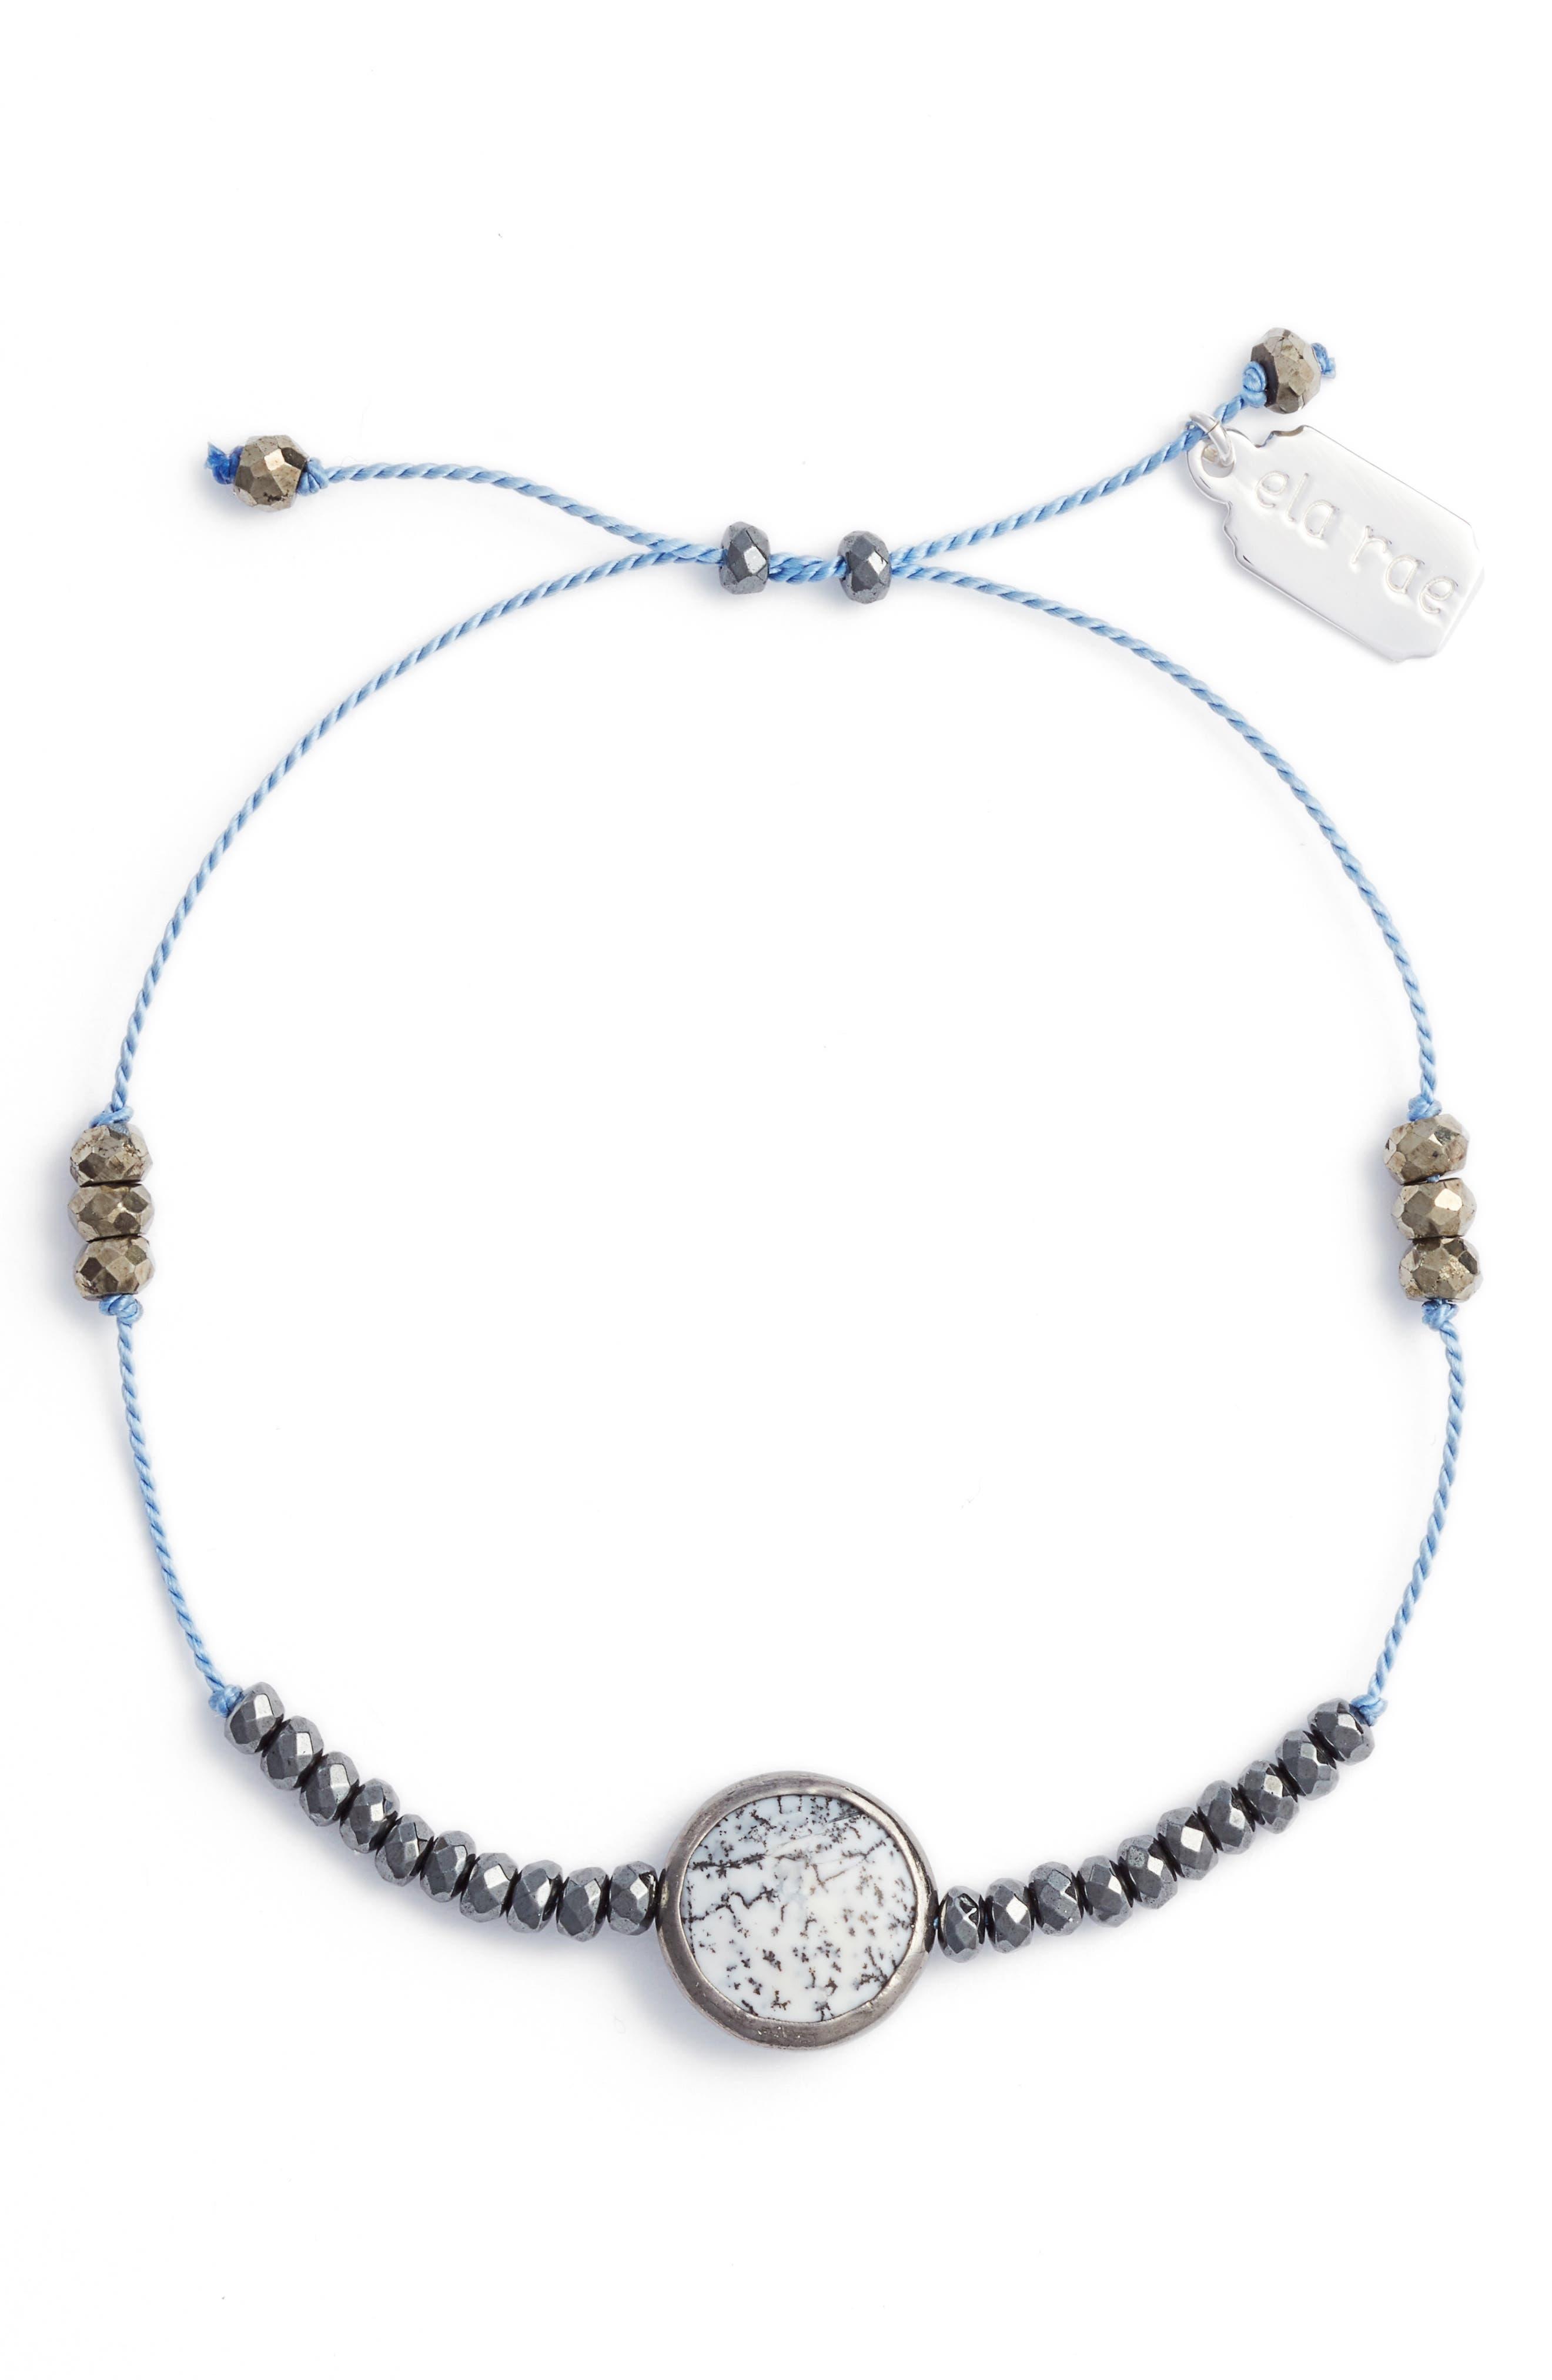 Sylvie Semiprecious Stone Bracelet,                             Main thumbnail 1, color,                             Cornflower Blue/ Hematite